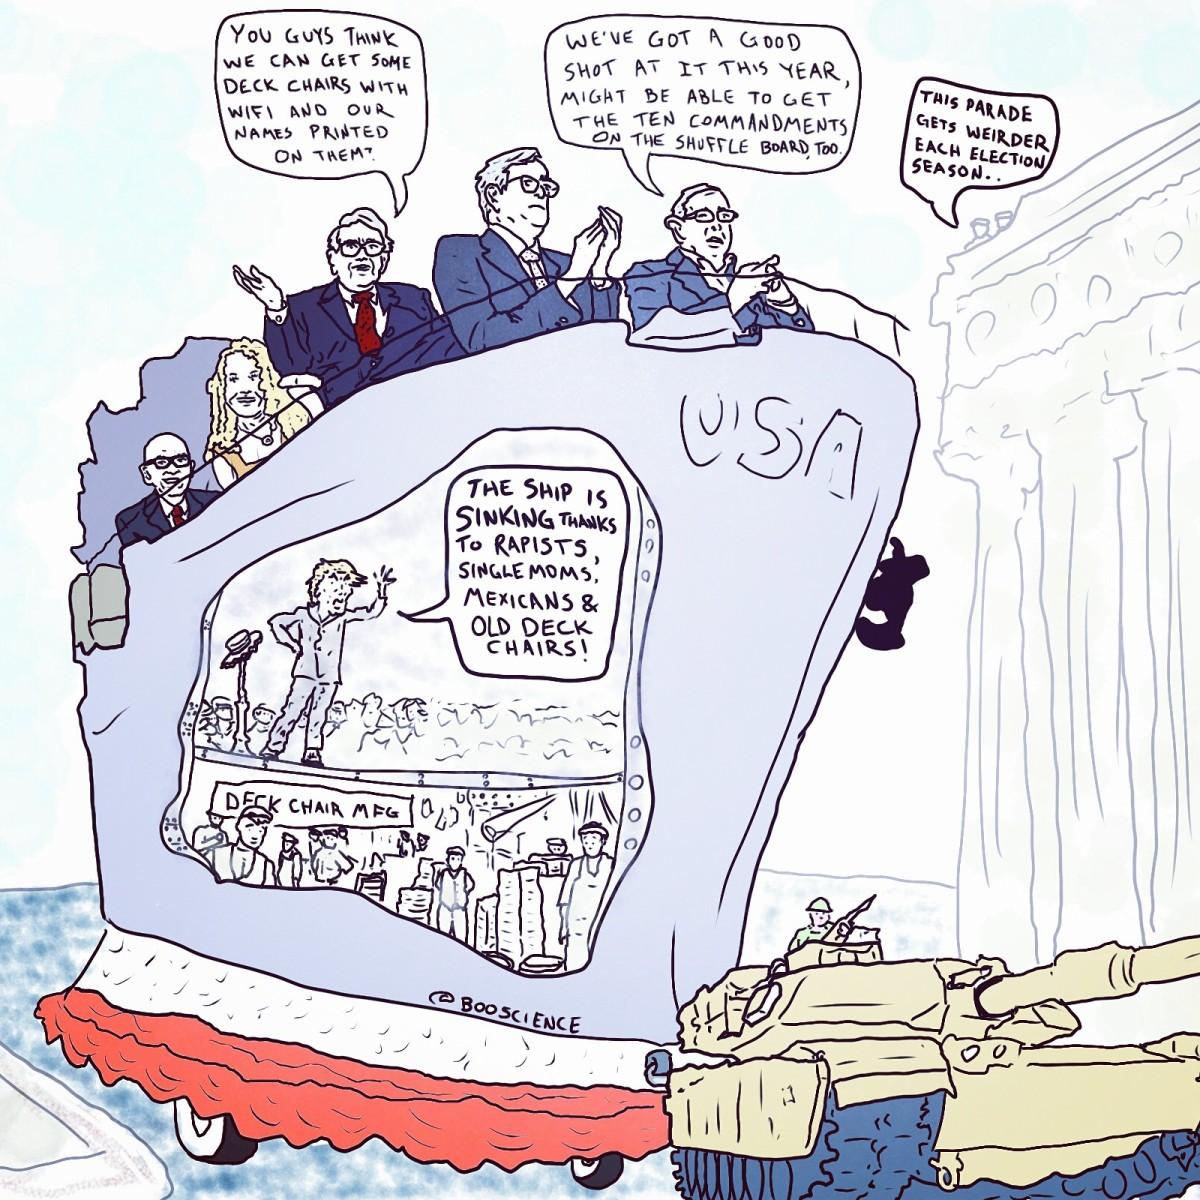 The Grand Ol' Parade